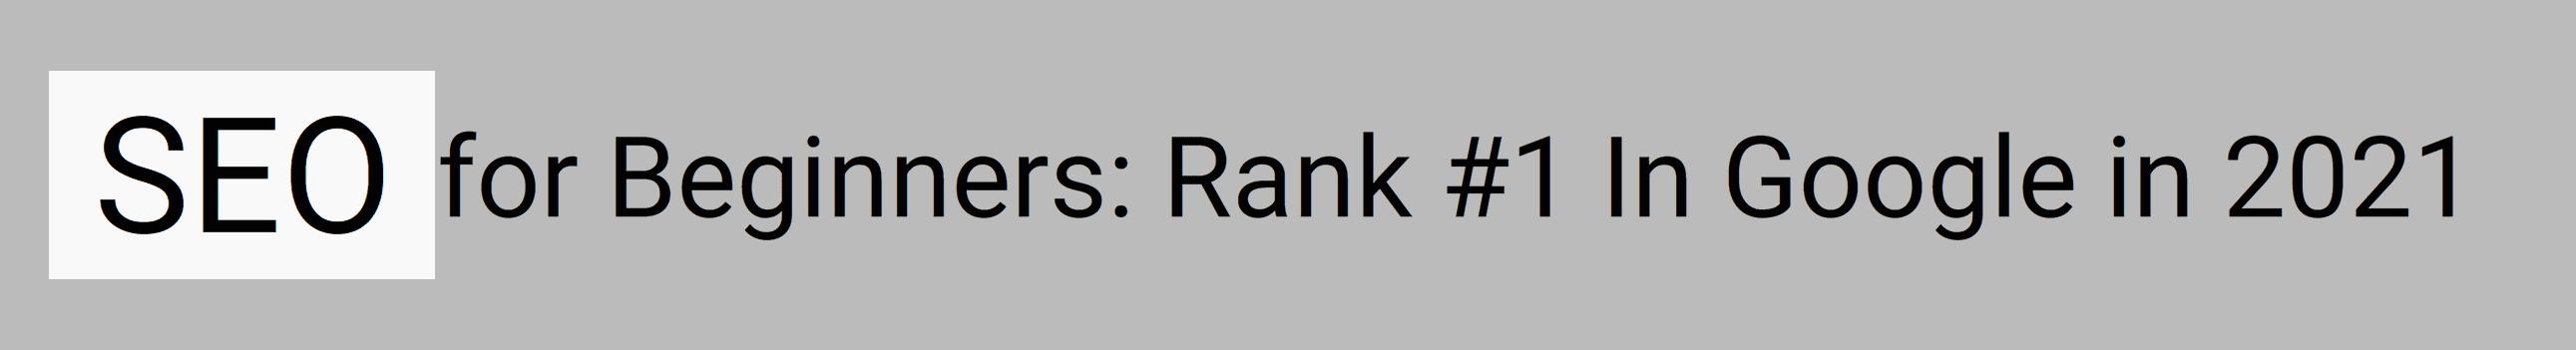 Keyword in video title